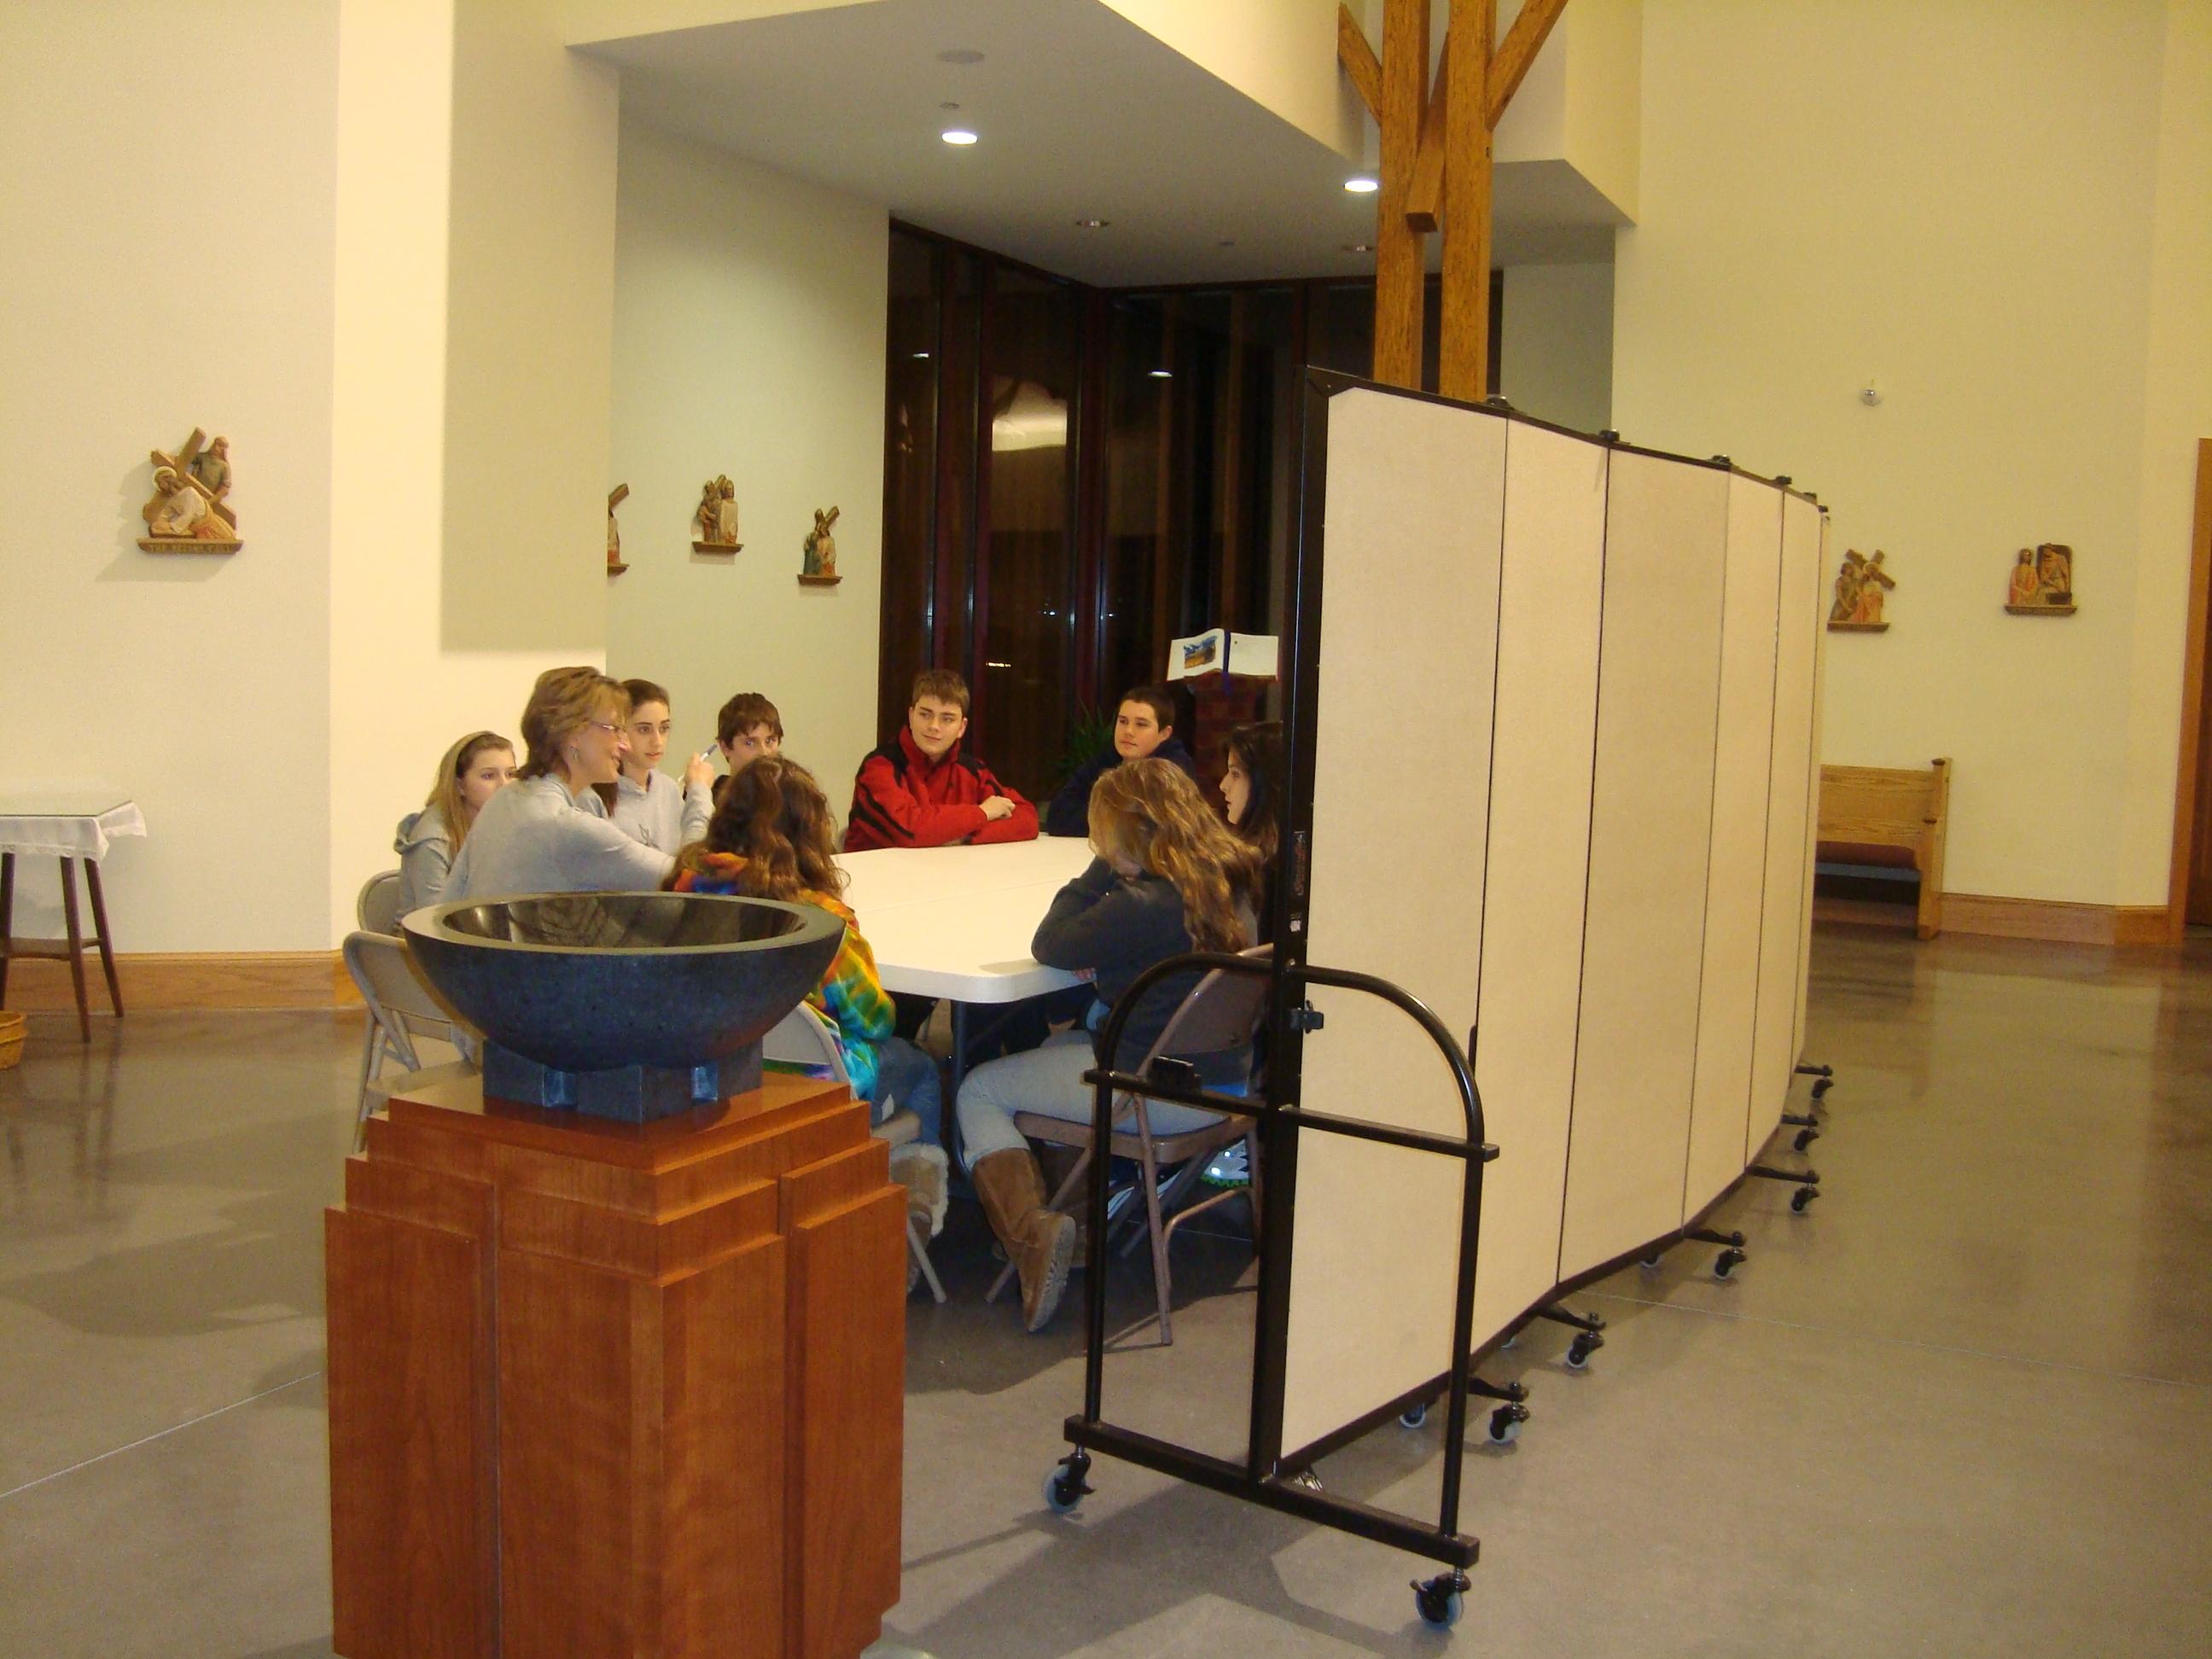 Church Room Divider makes a Classroom Area in Church